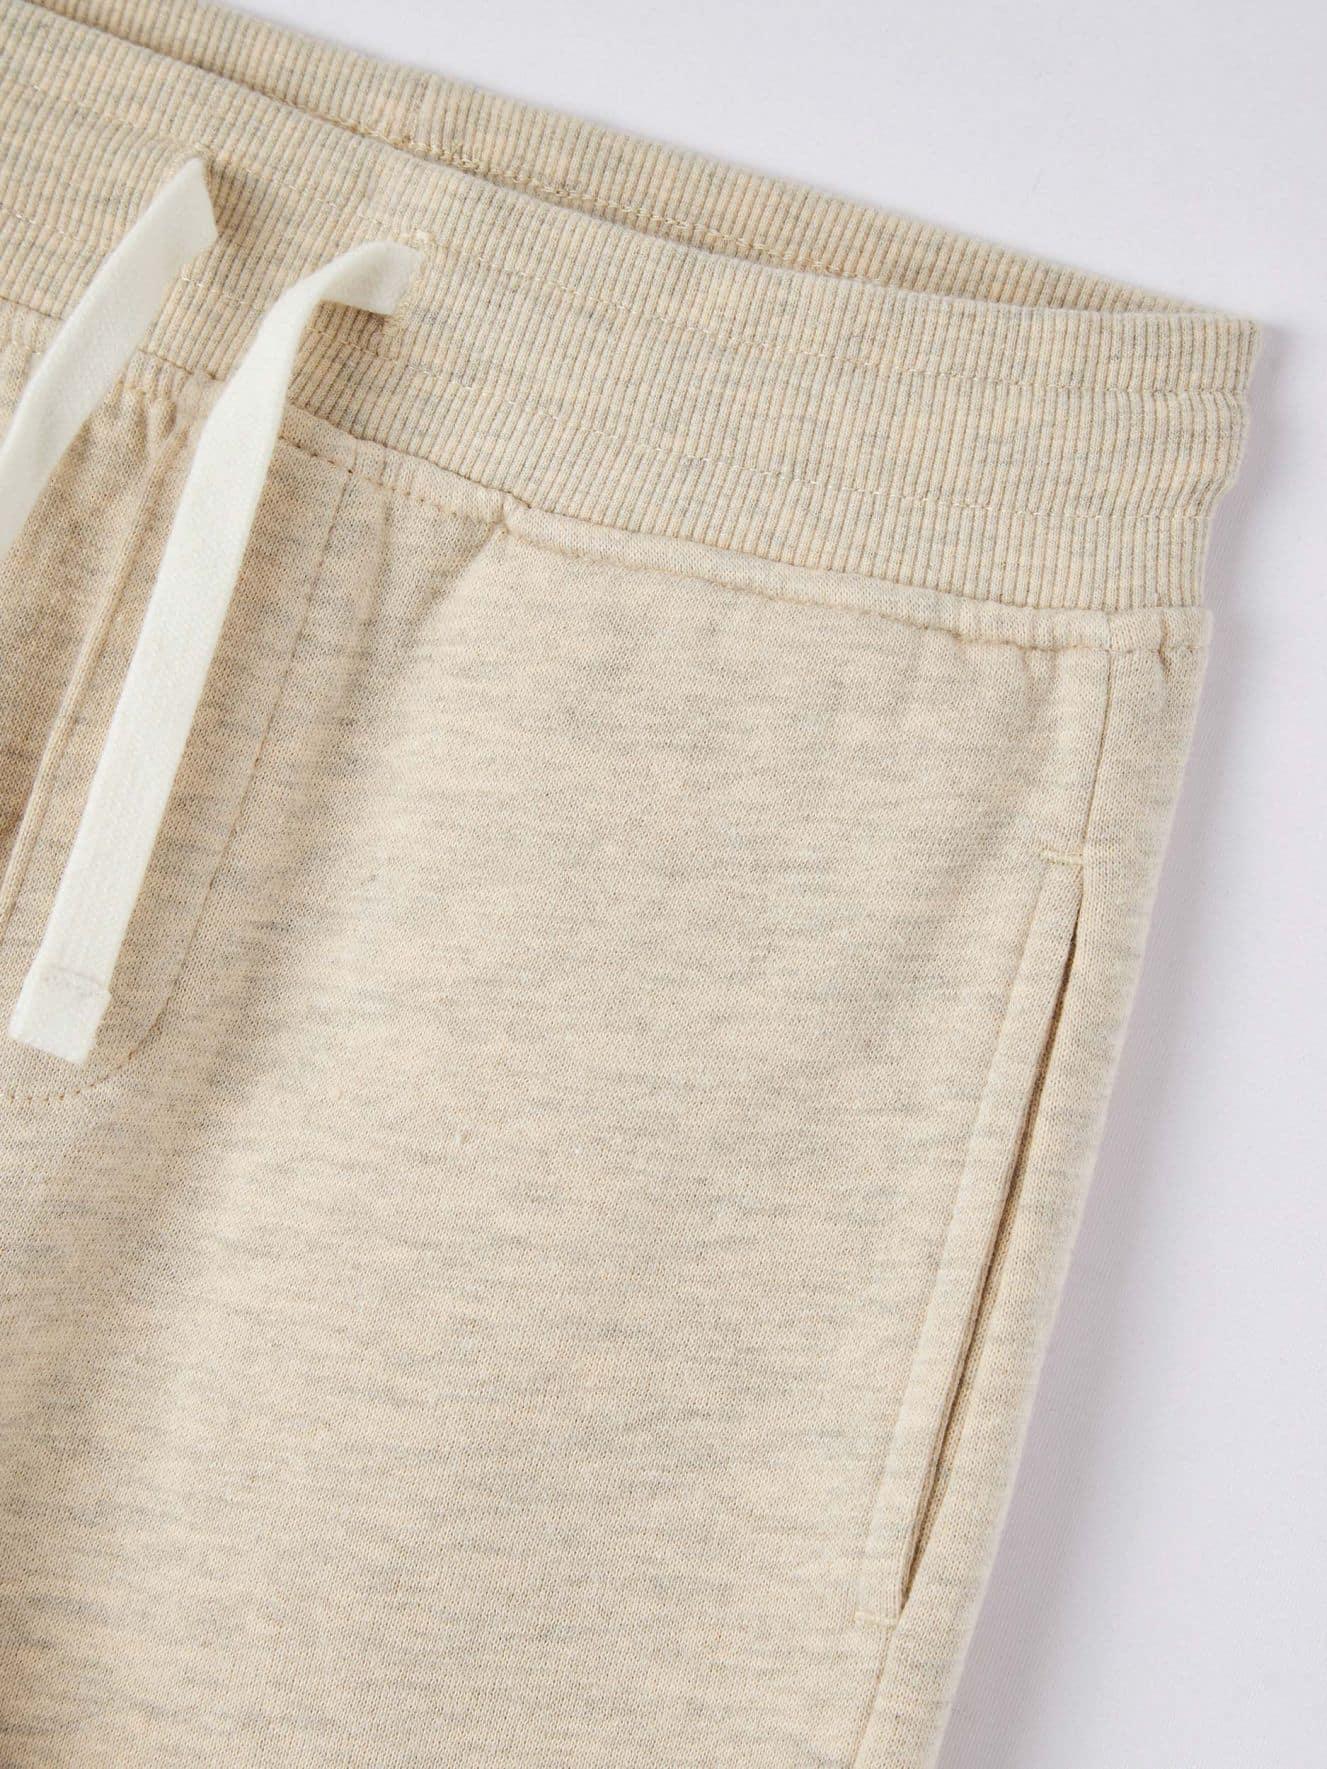 Pantalone ginnico Lungo Bambino Kids